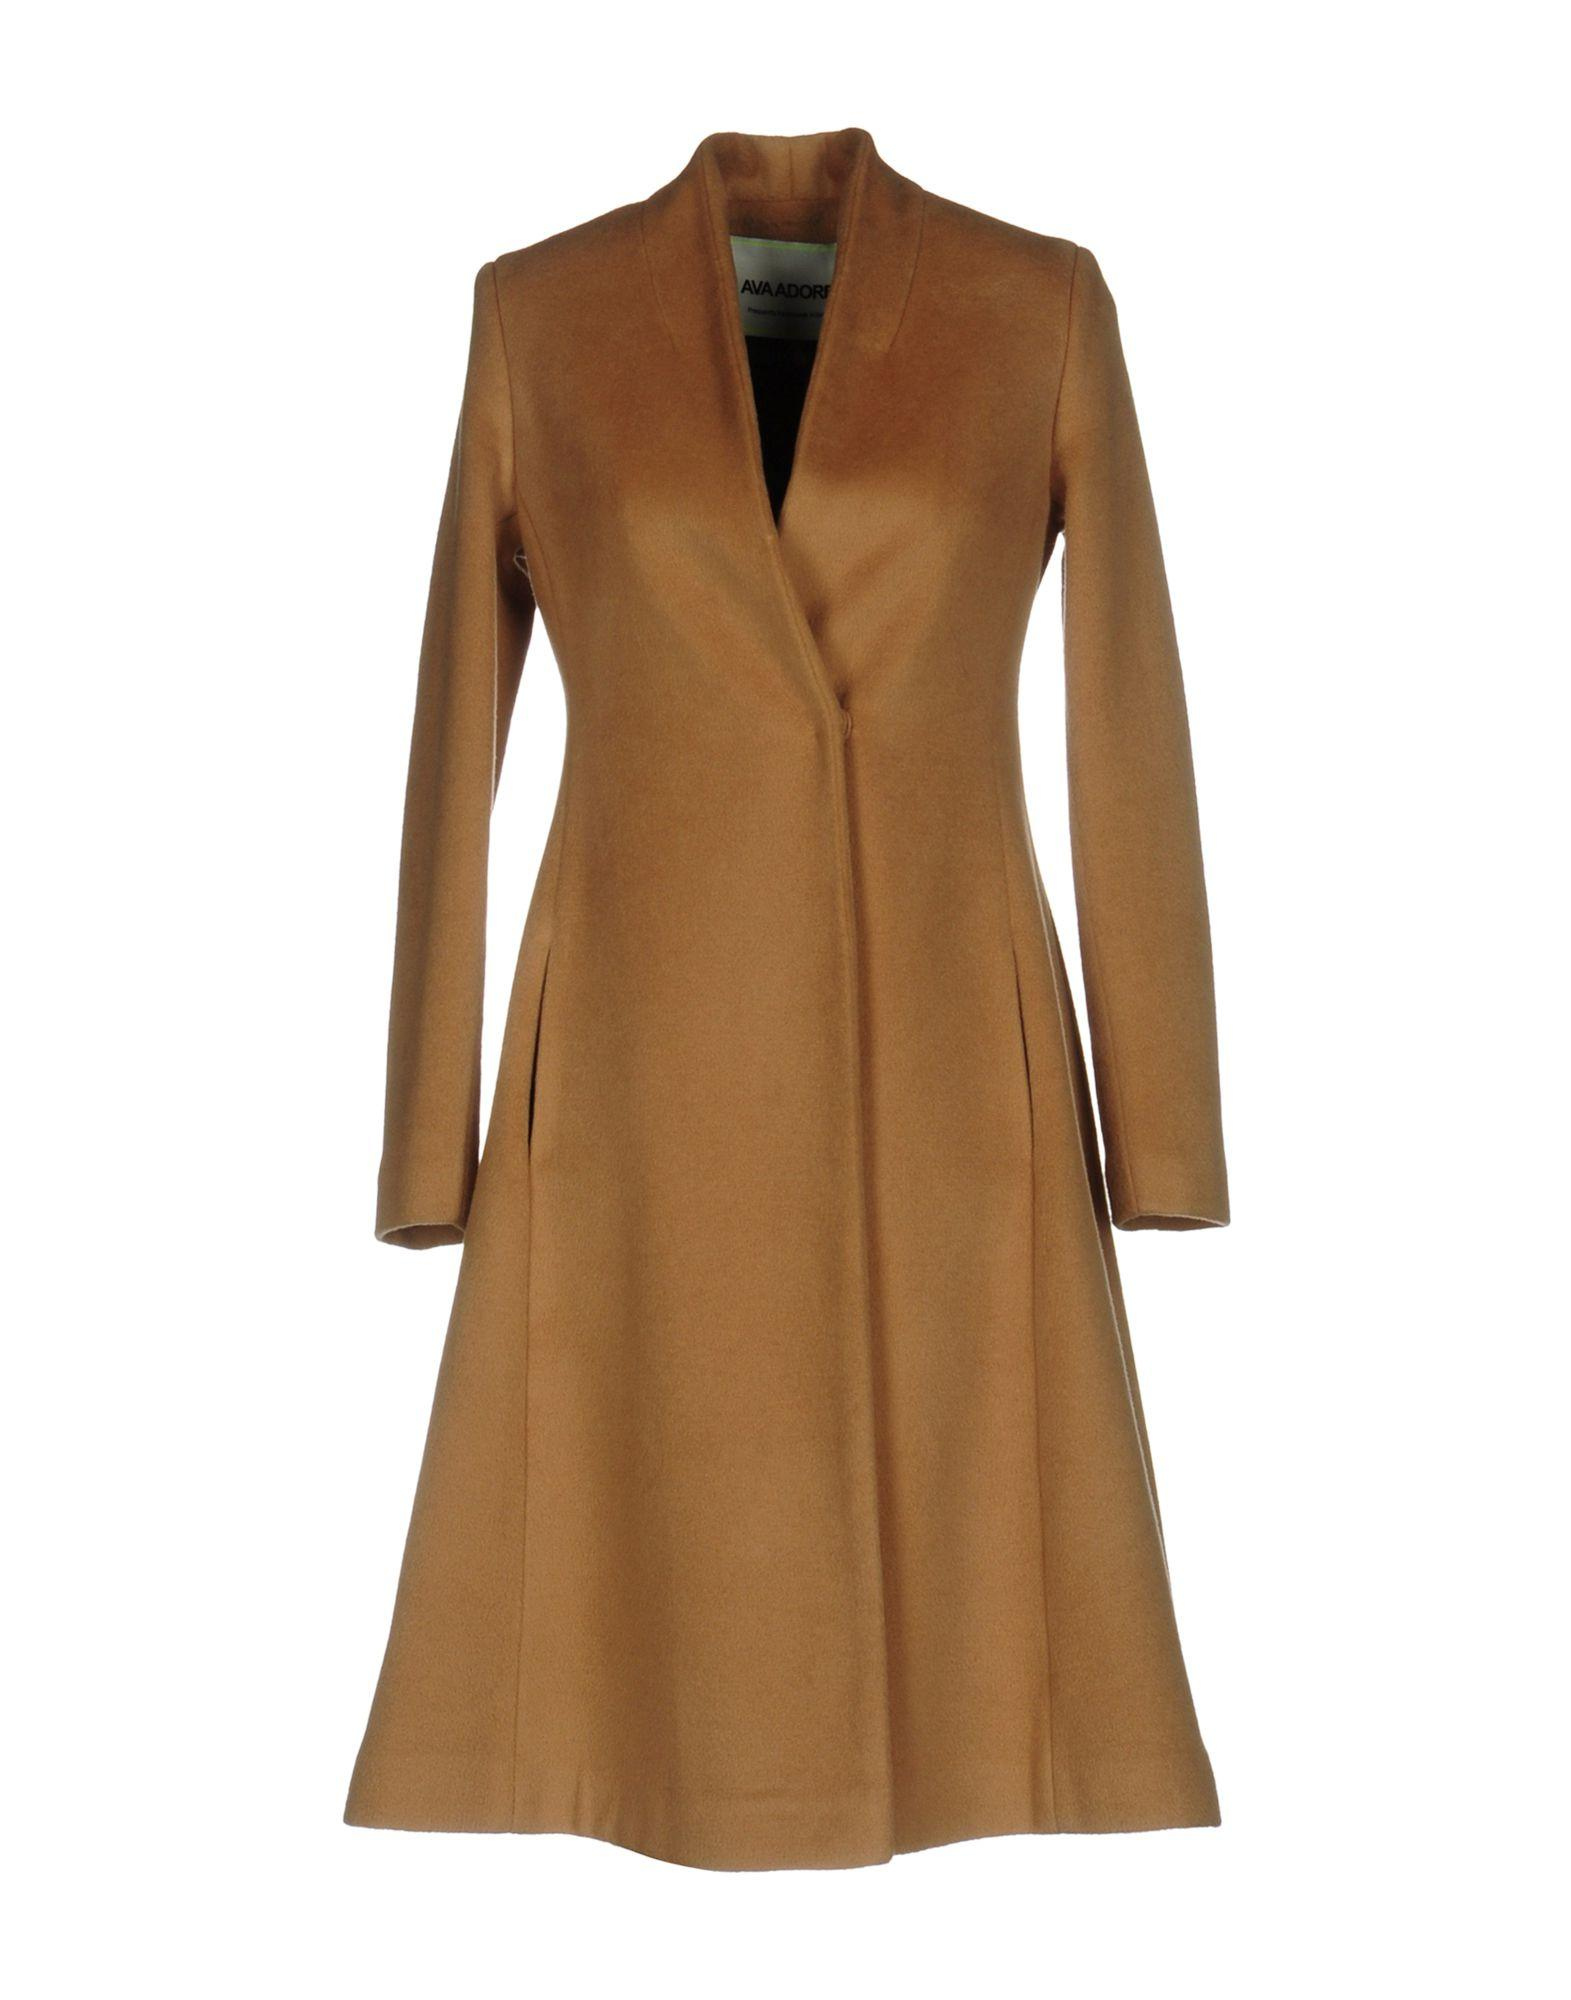 Ava Adore Coat In Khaki